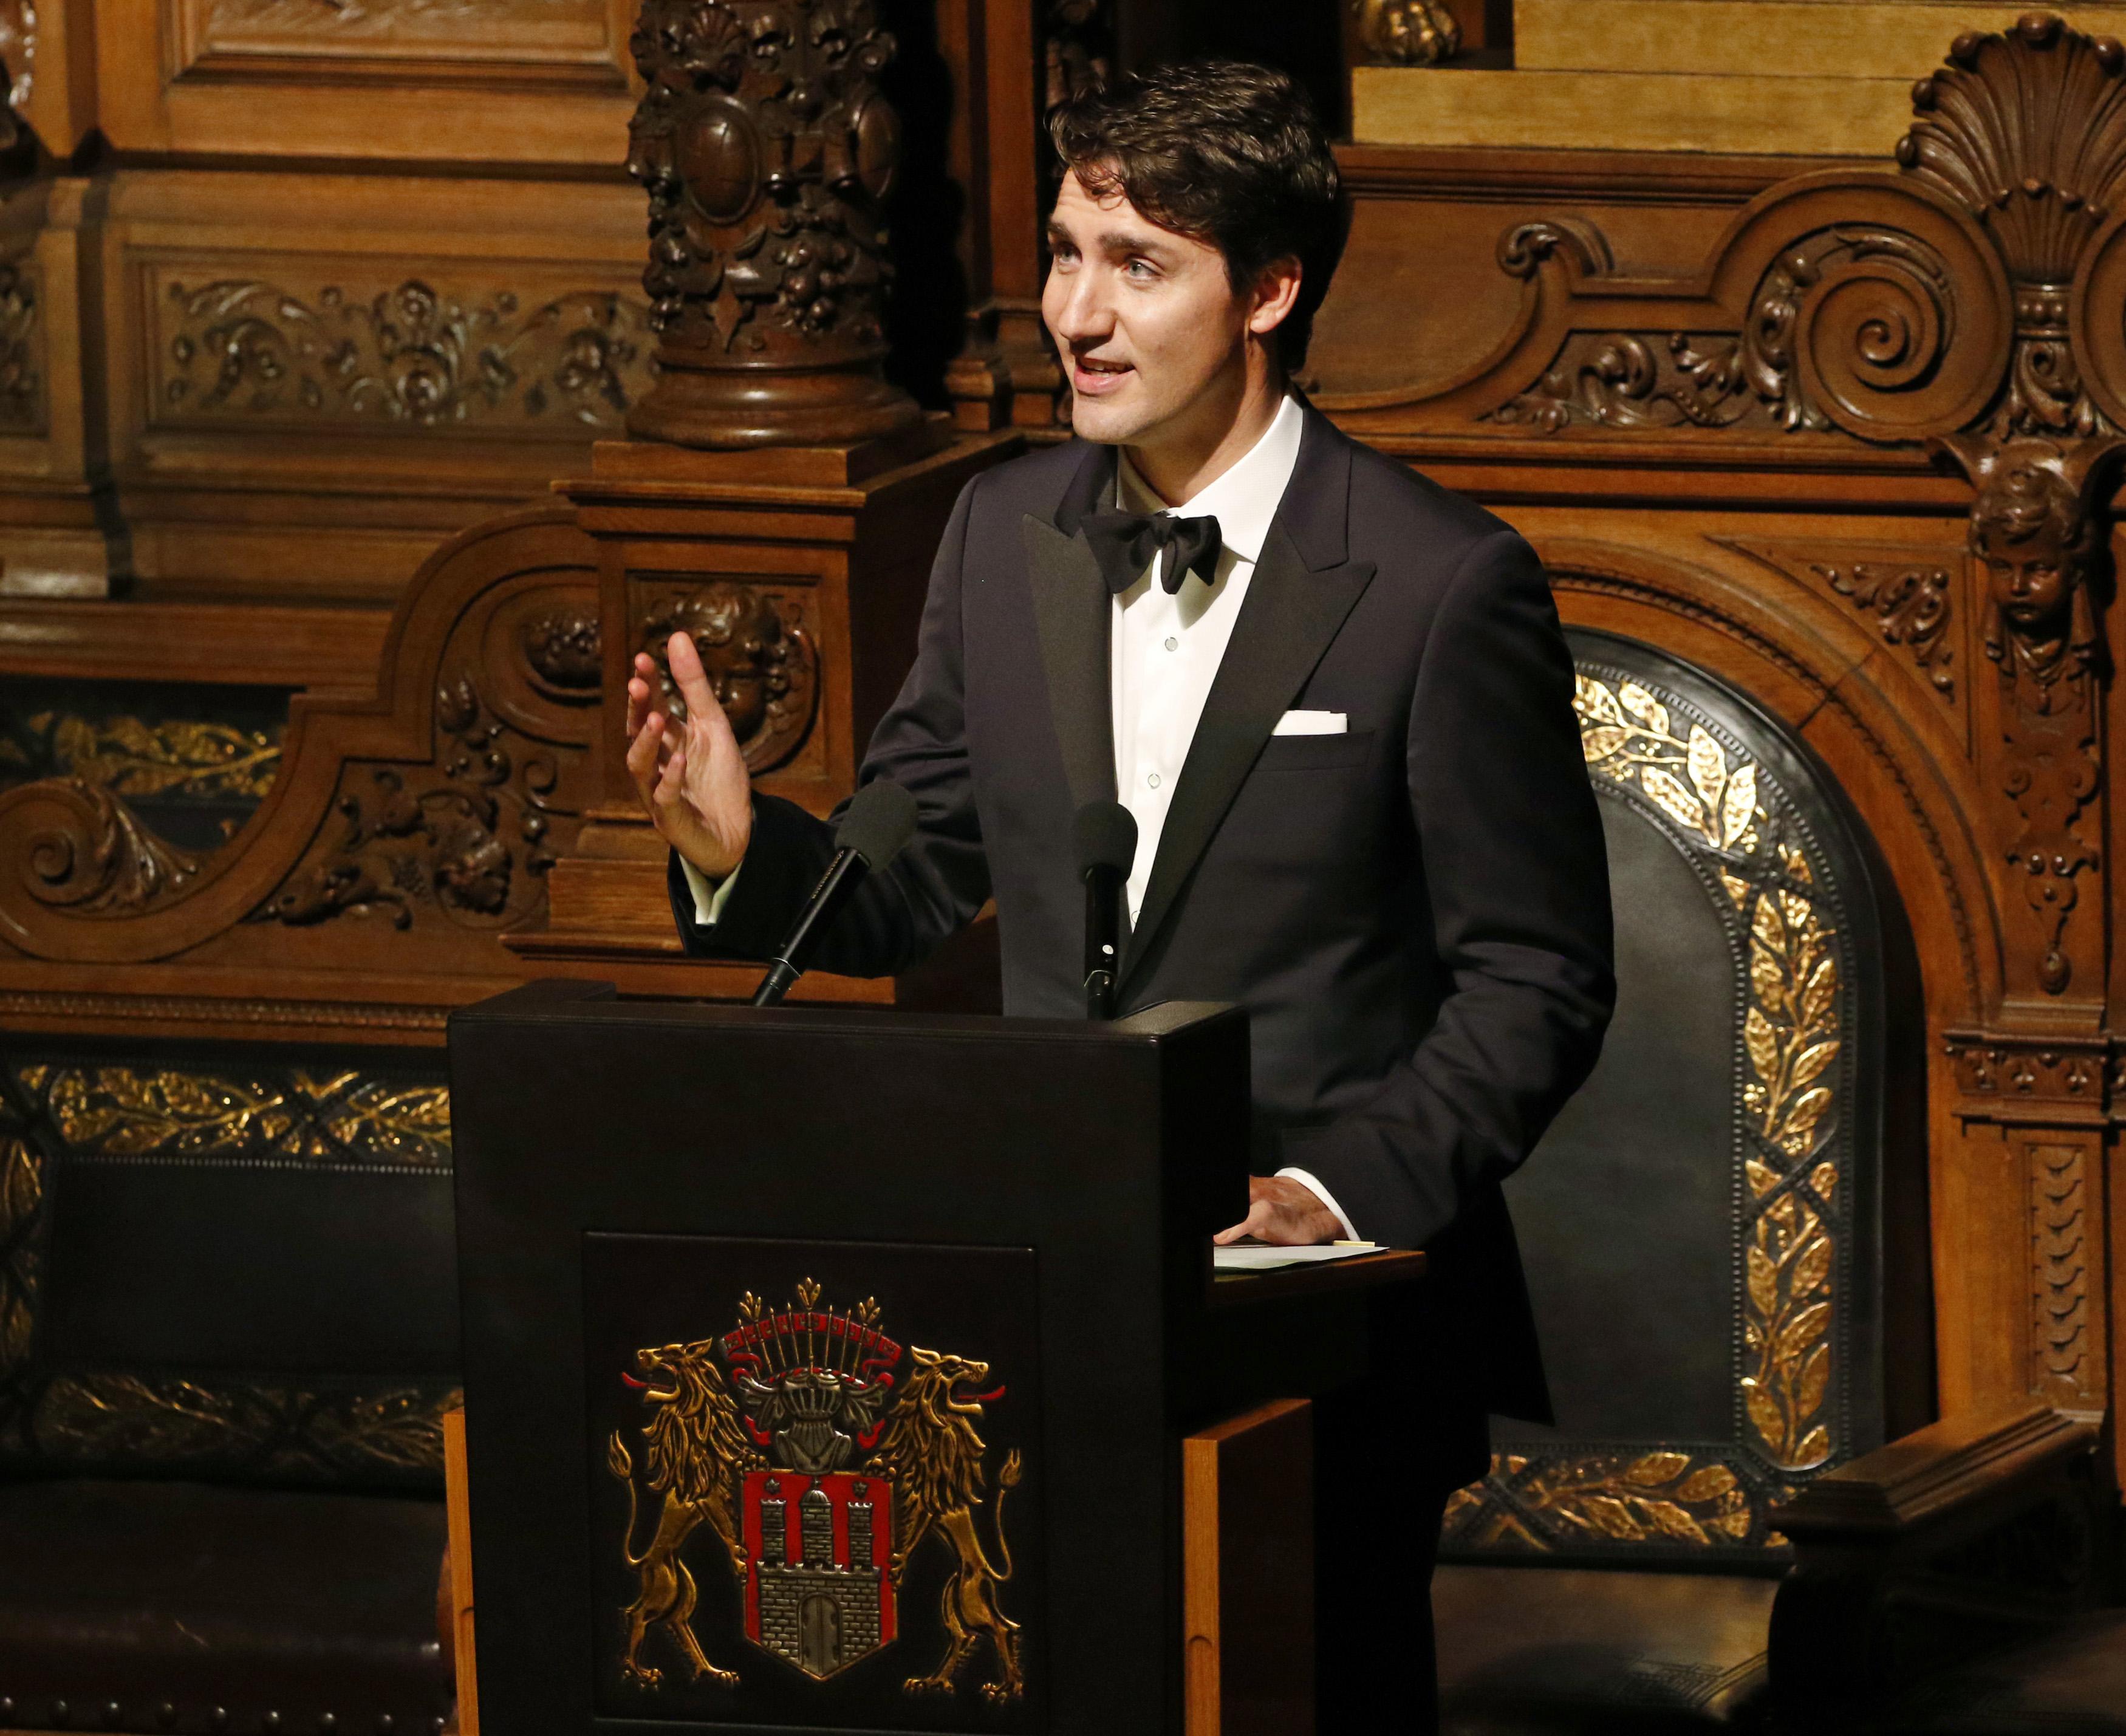 Премьер-министр Канады Джастин Трюдо. Фото: EPA